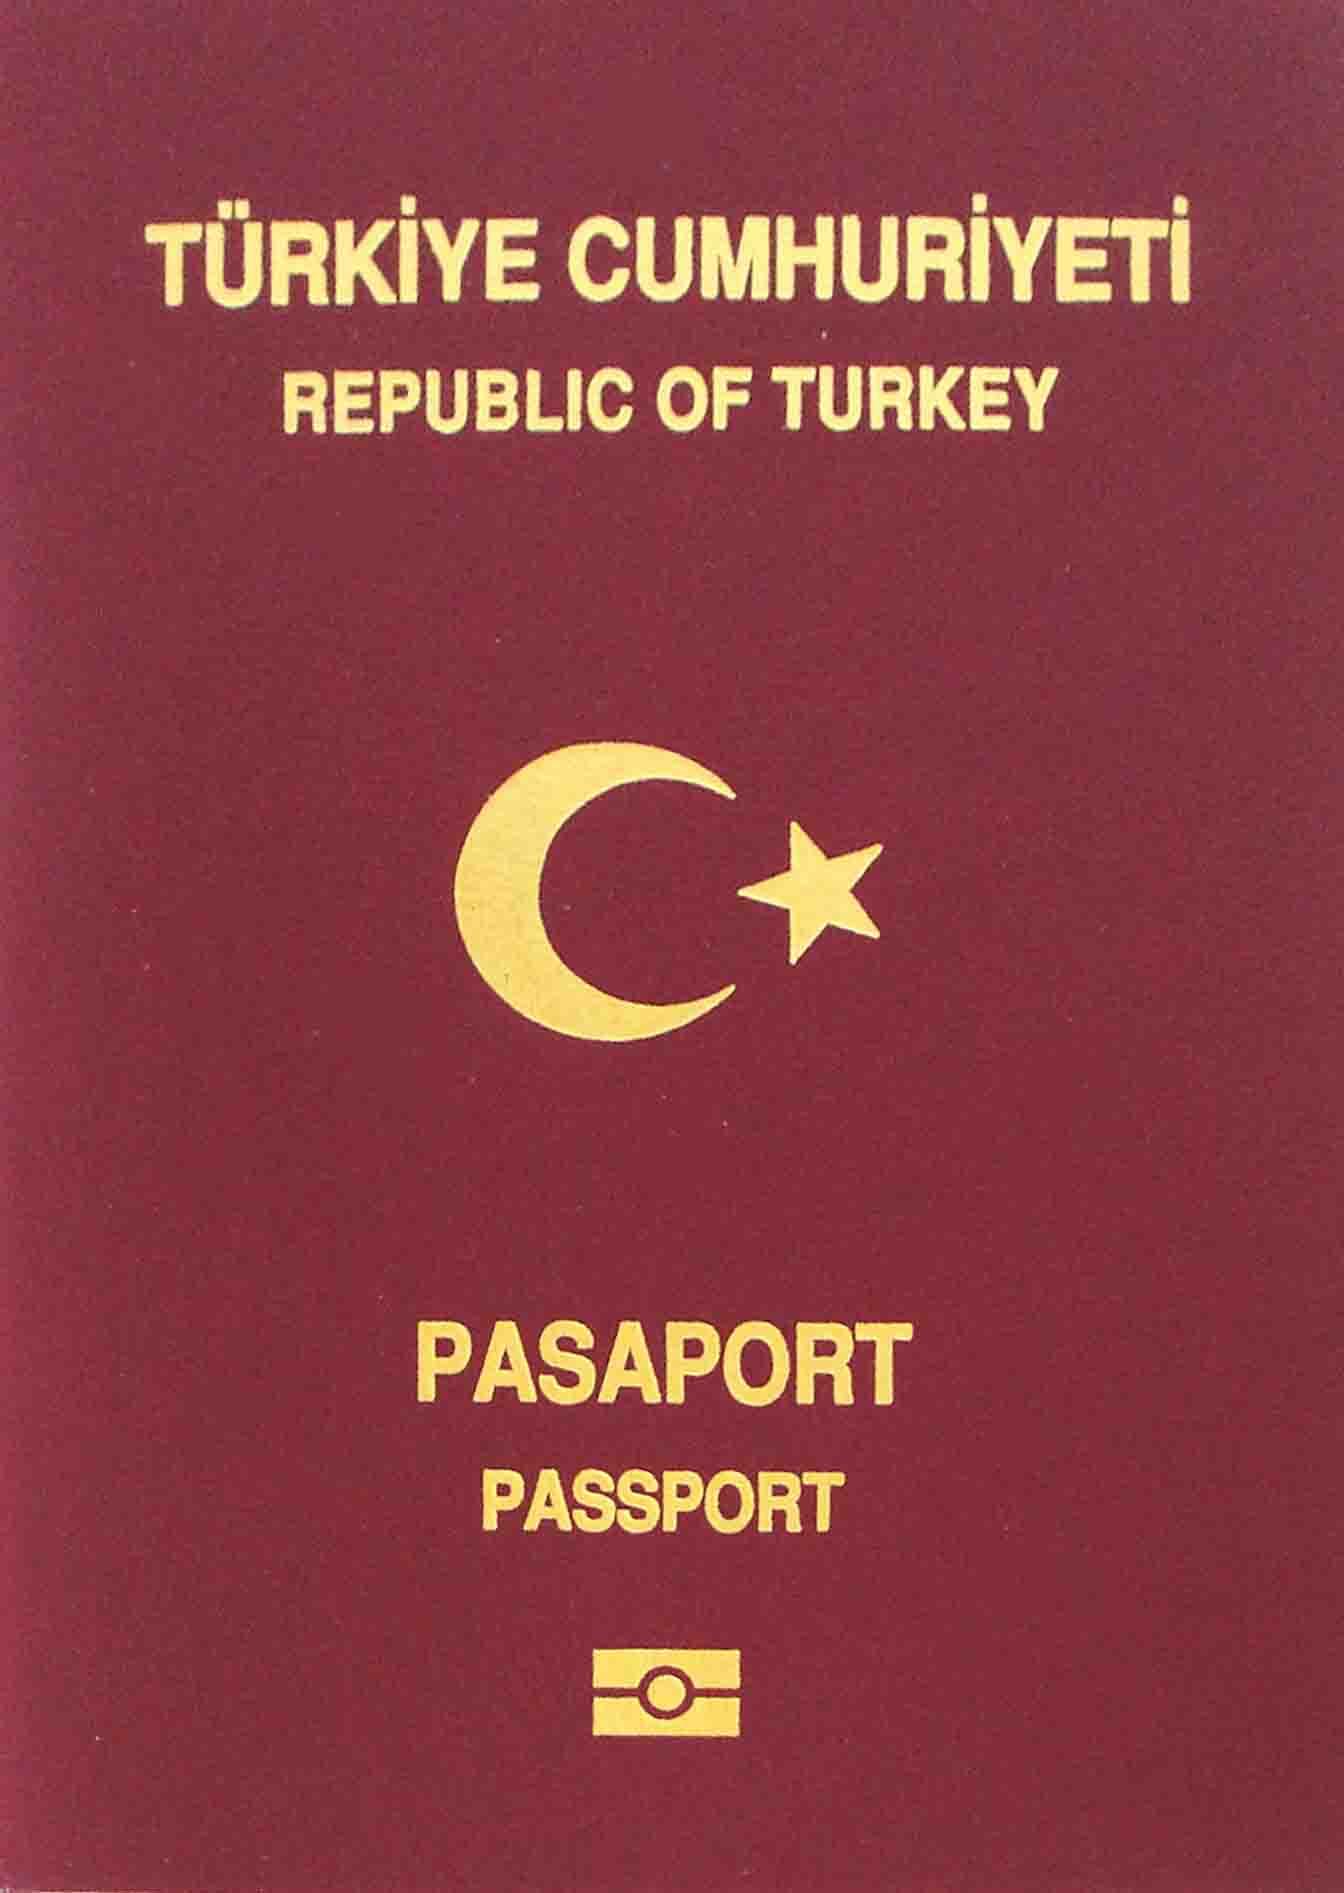 e2c6221cf3f6 Turkish passport - Wikipedia